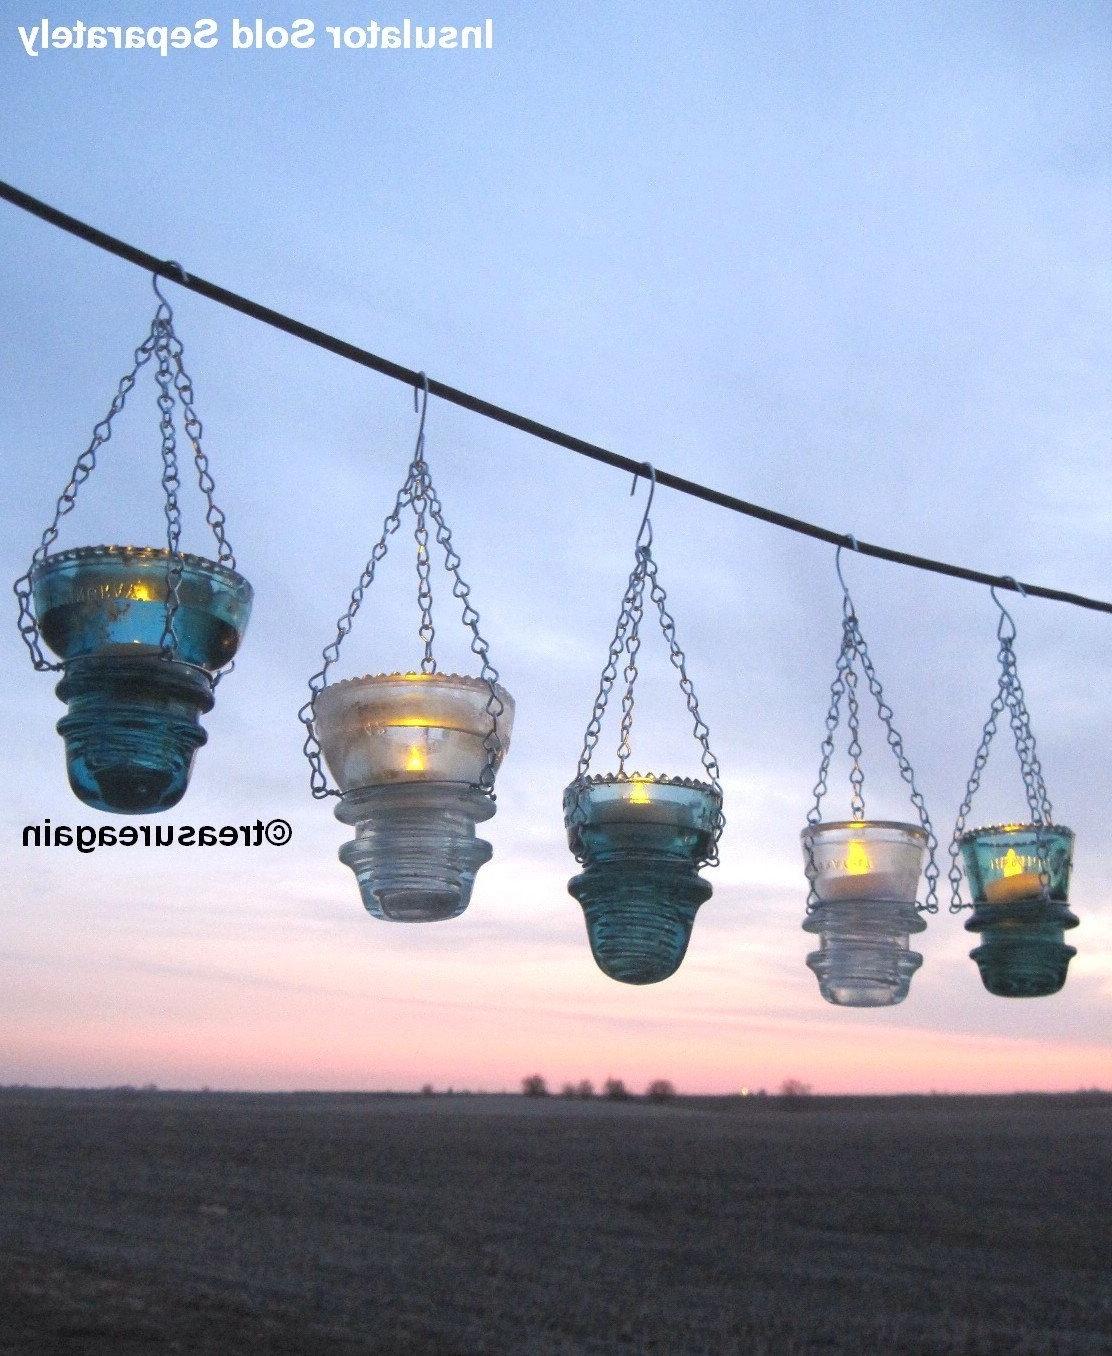 Favorite Etsy Outdoor Lanterns With Diy Insulator Hanger Lantern Tea Light Holder, Outdoor Hanging (View 14 of 20)